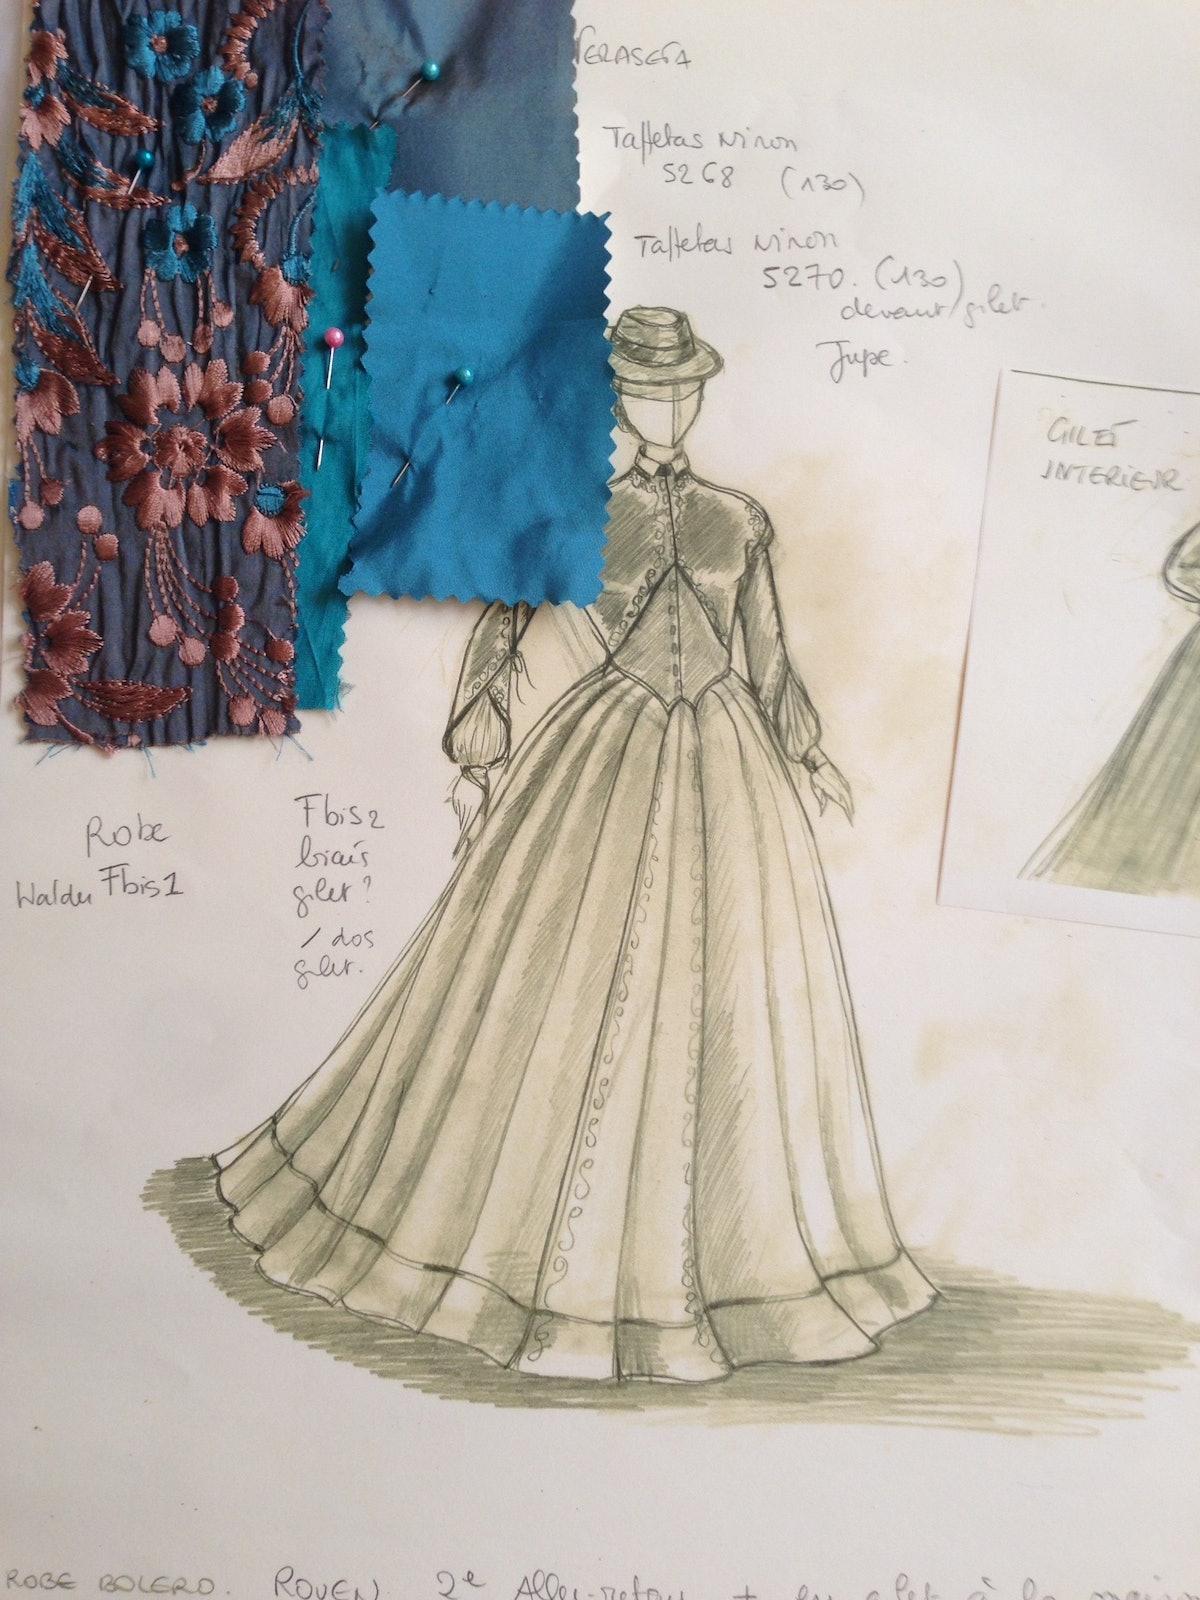 Madam Bovary Costumes